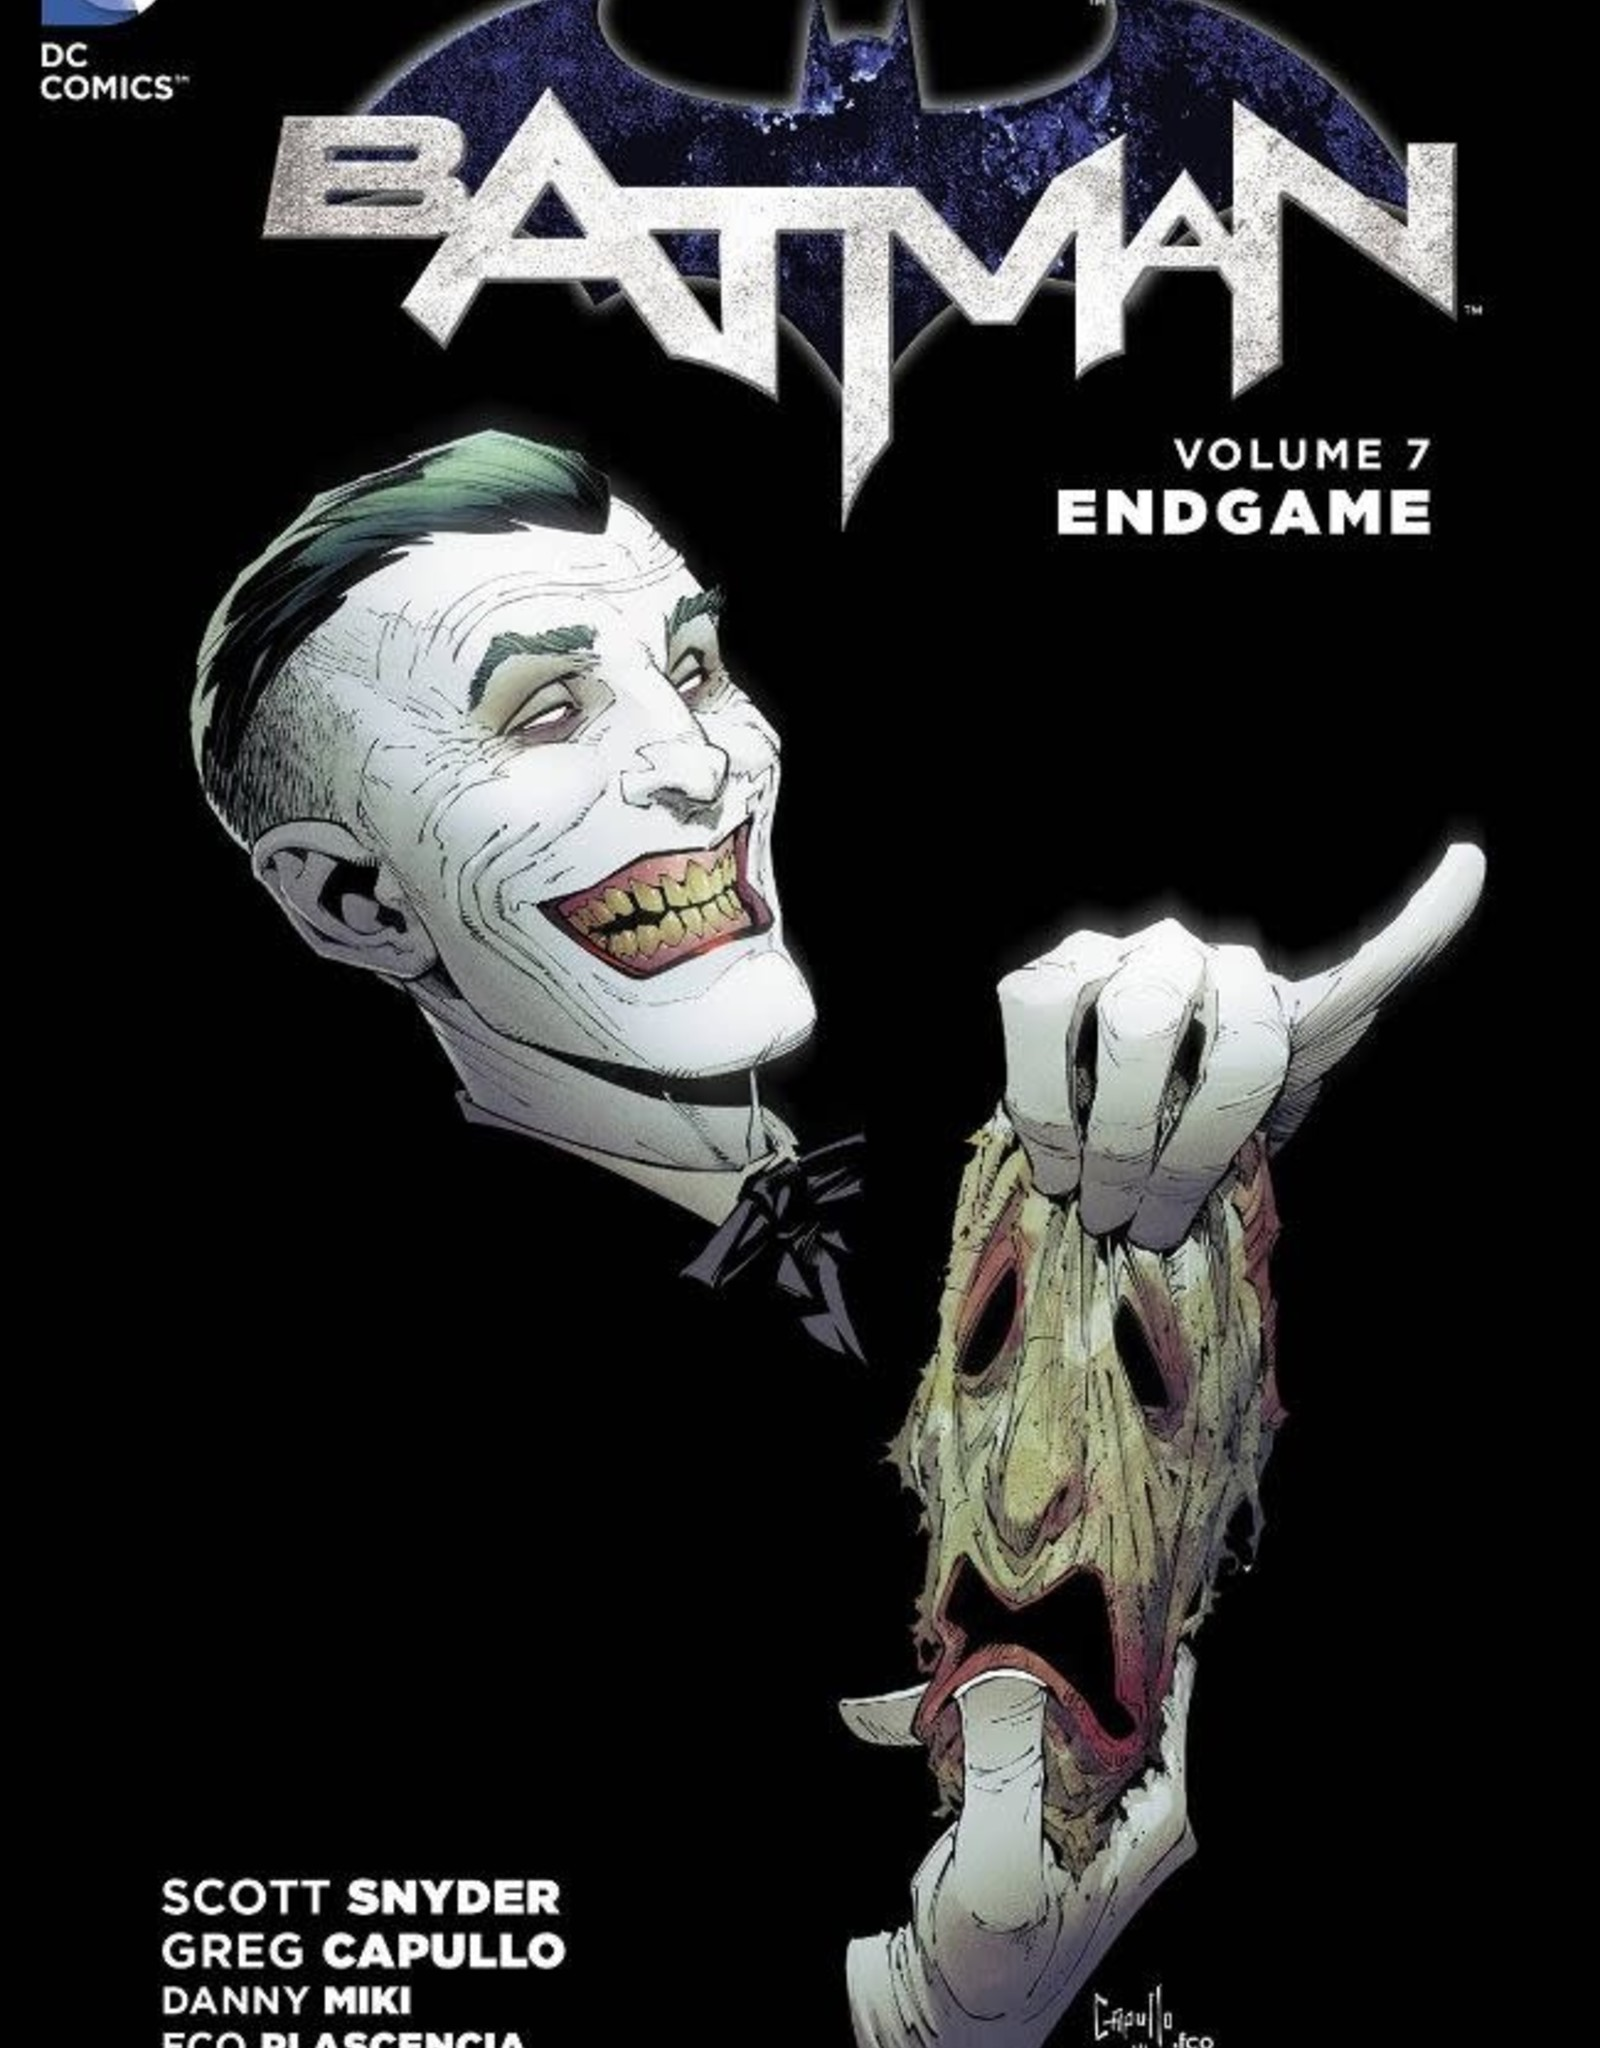 DC Comics Batman (N52) Vol 07 Endgame